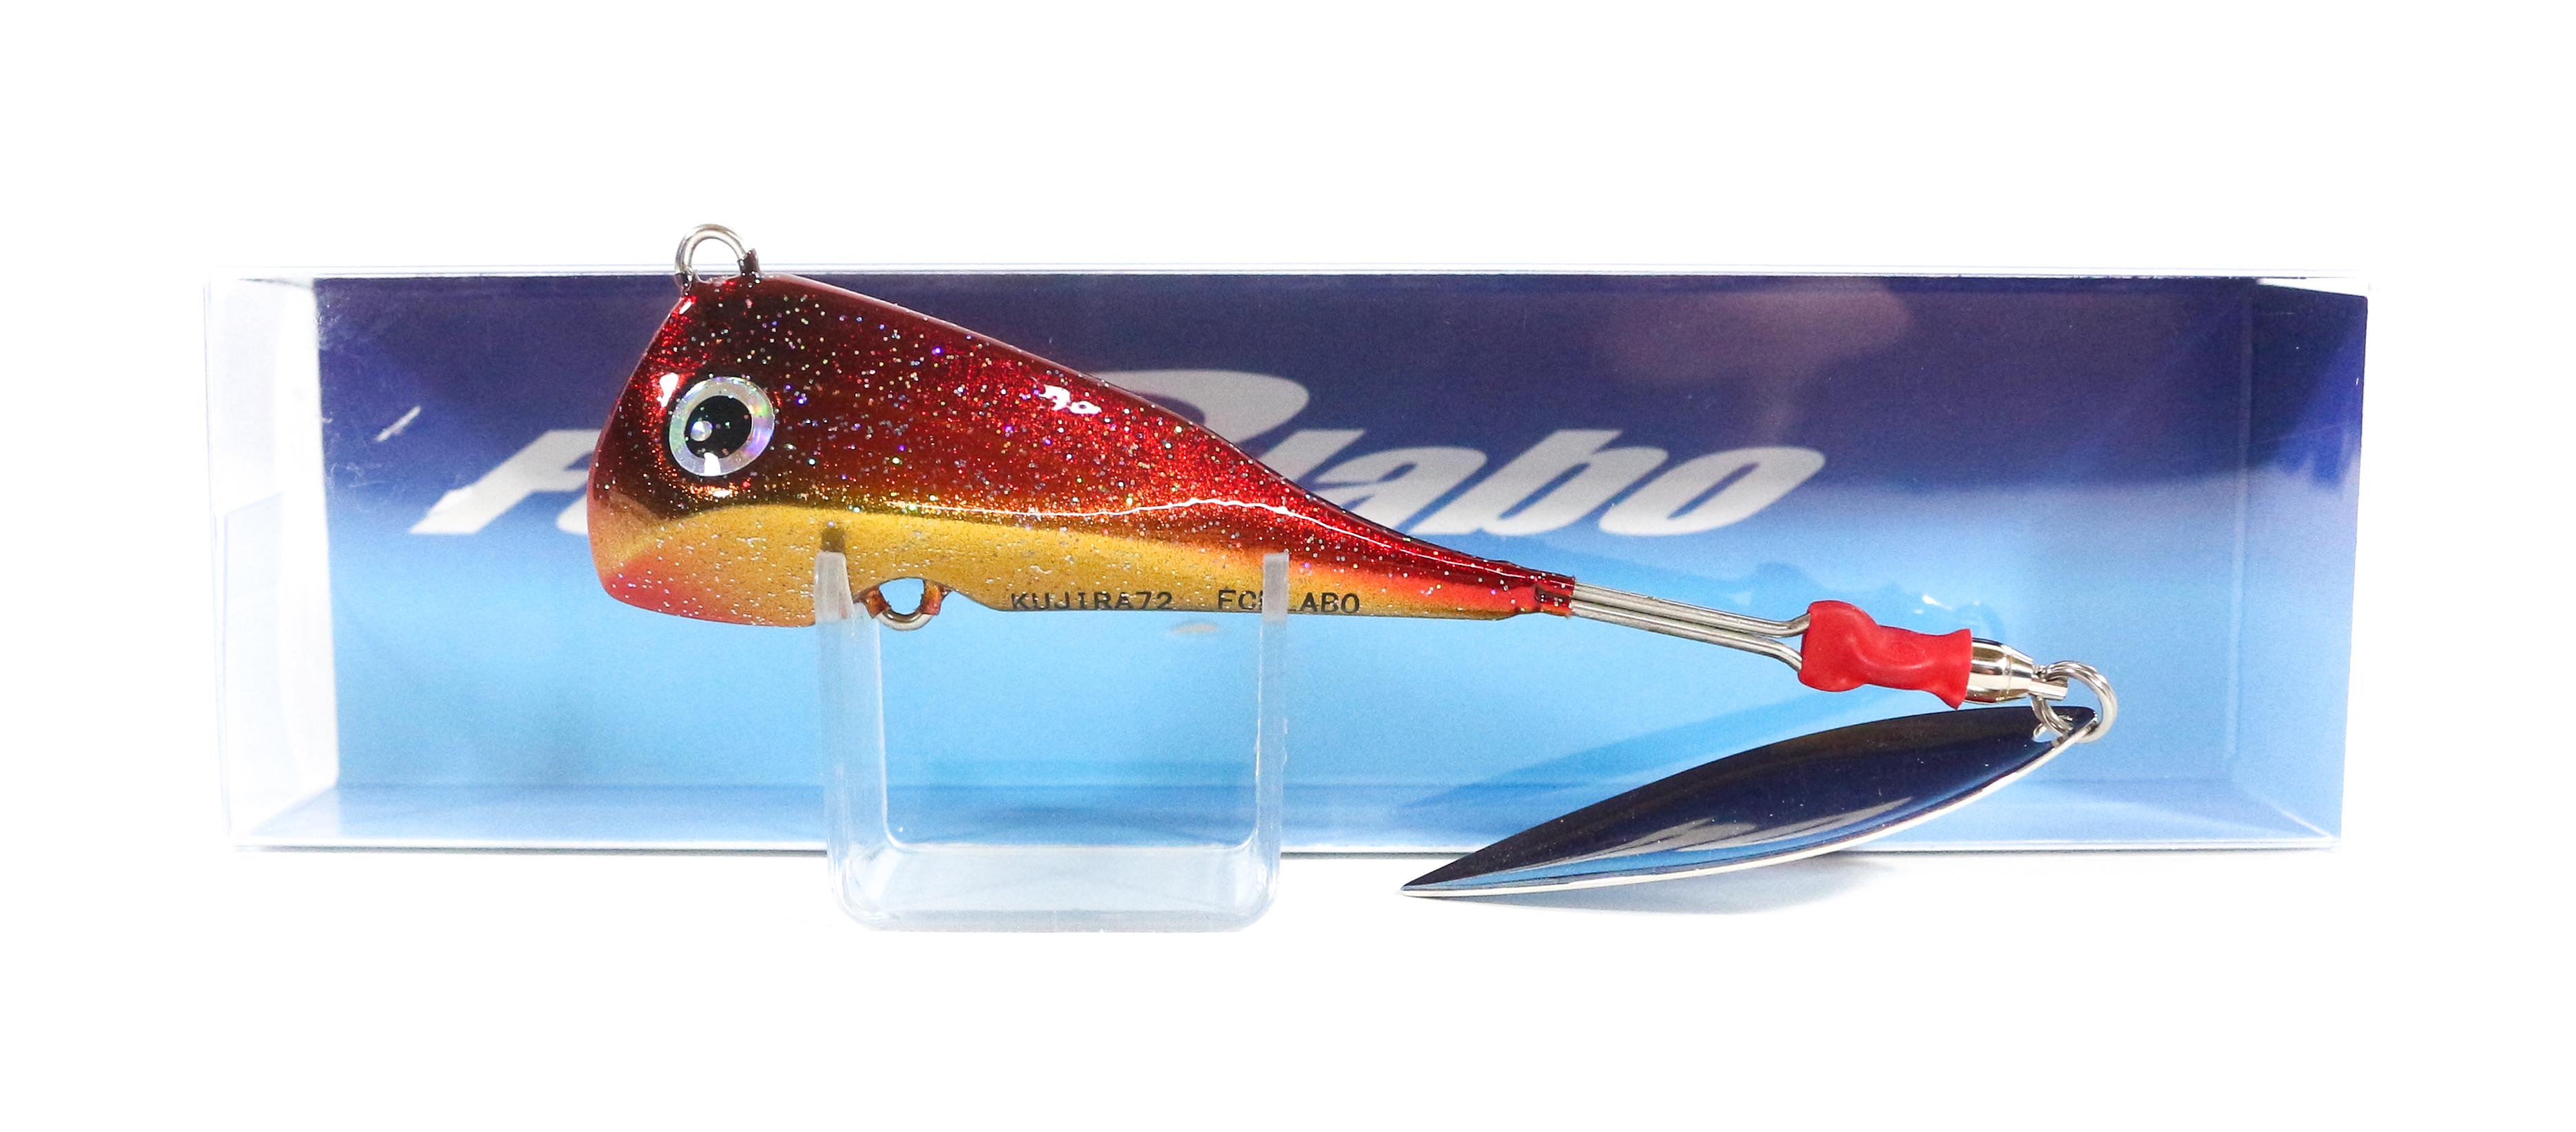 FCL Labo Spinner Tail Madai Jig Kujira 72 grams Sinking Lure PRG (2639)